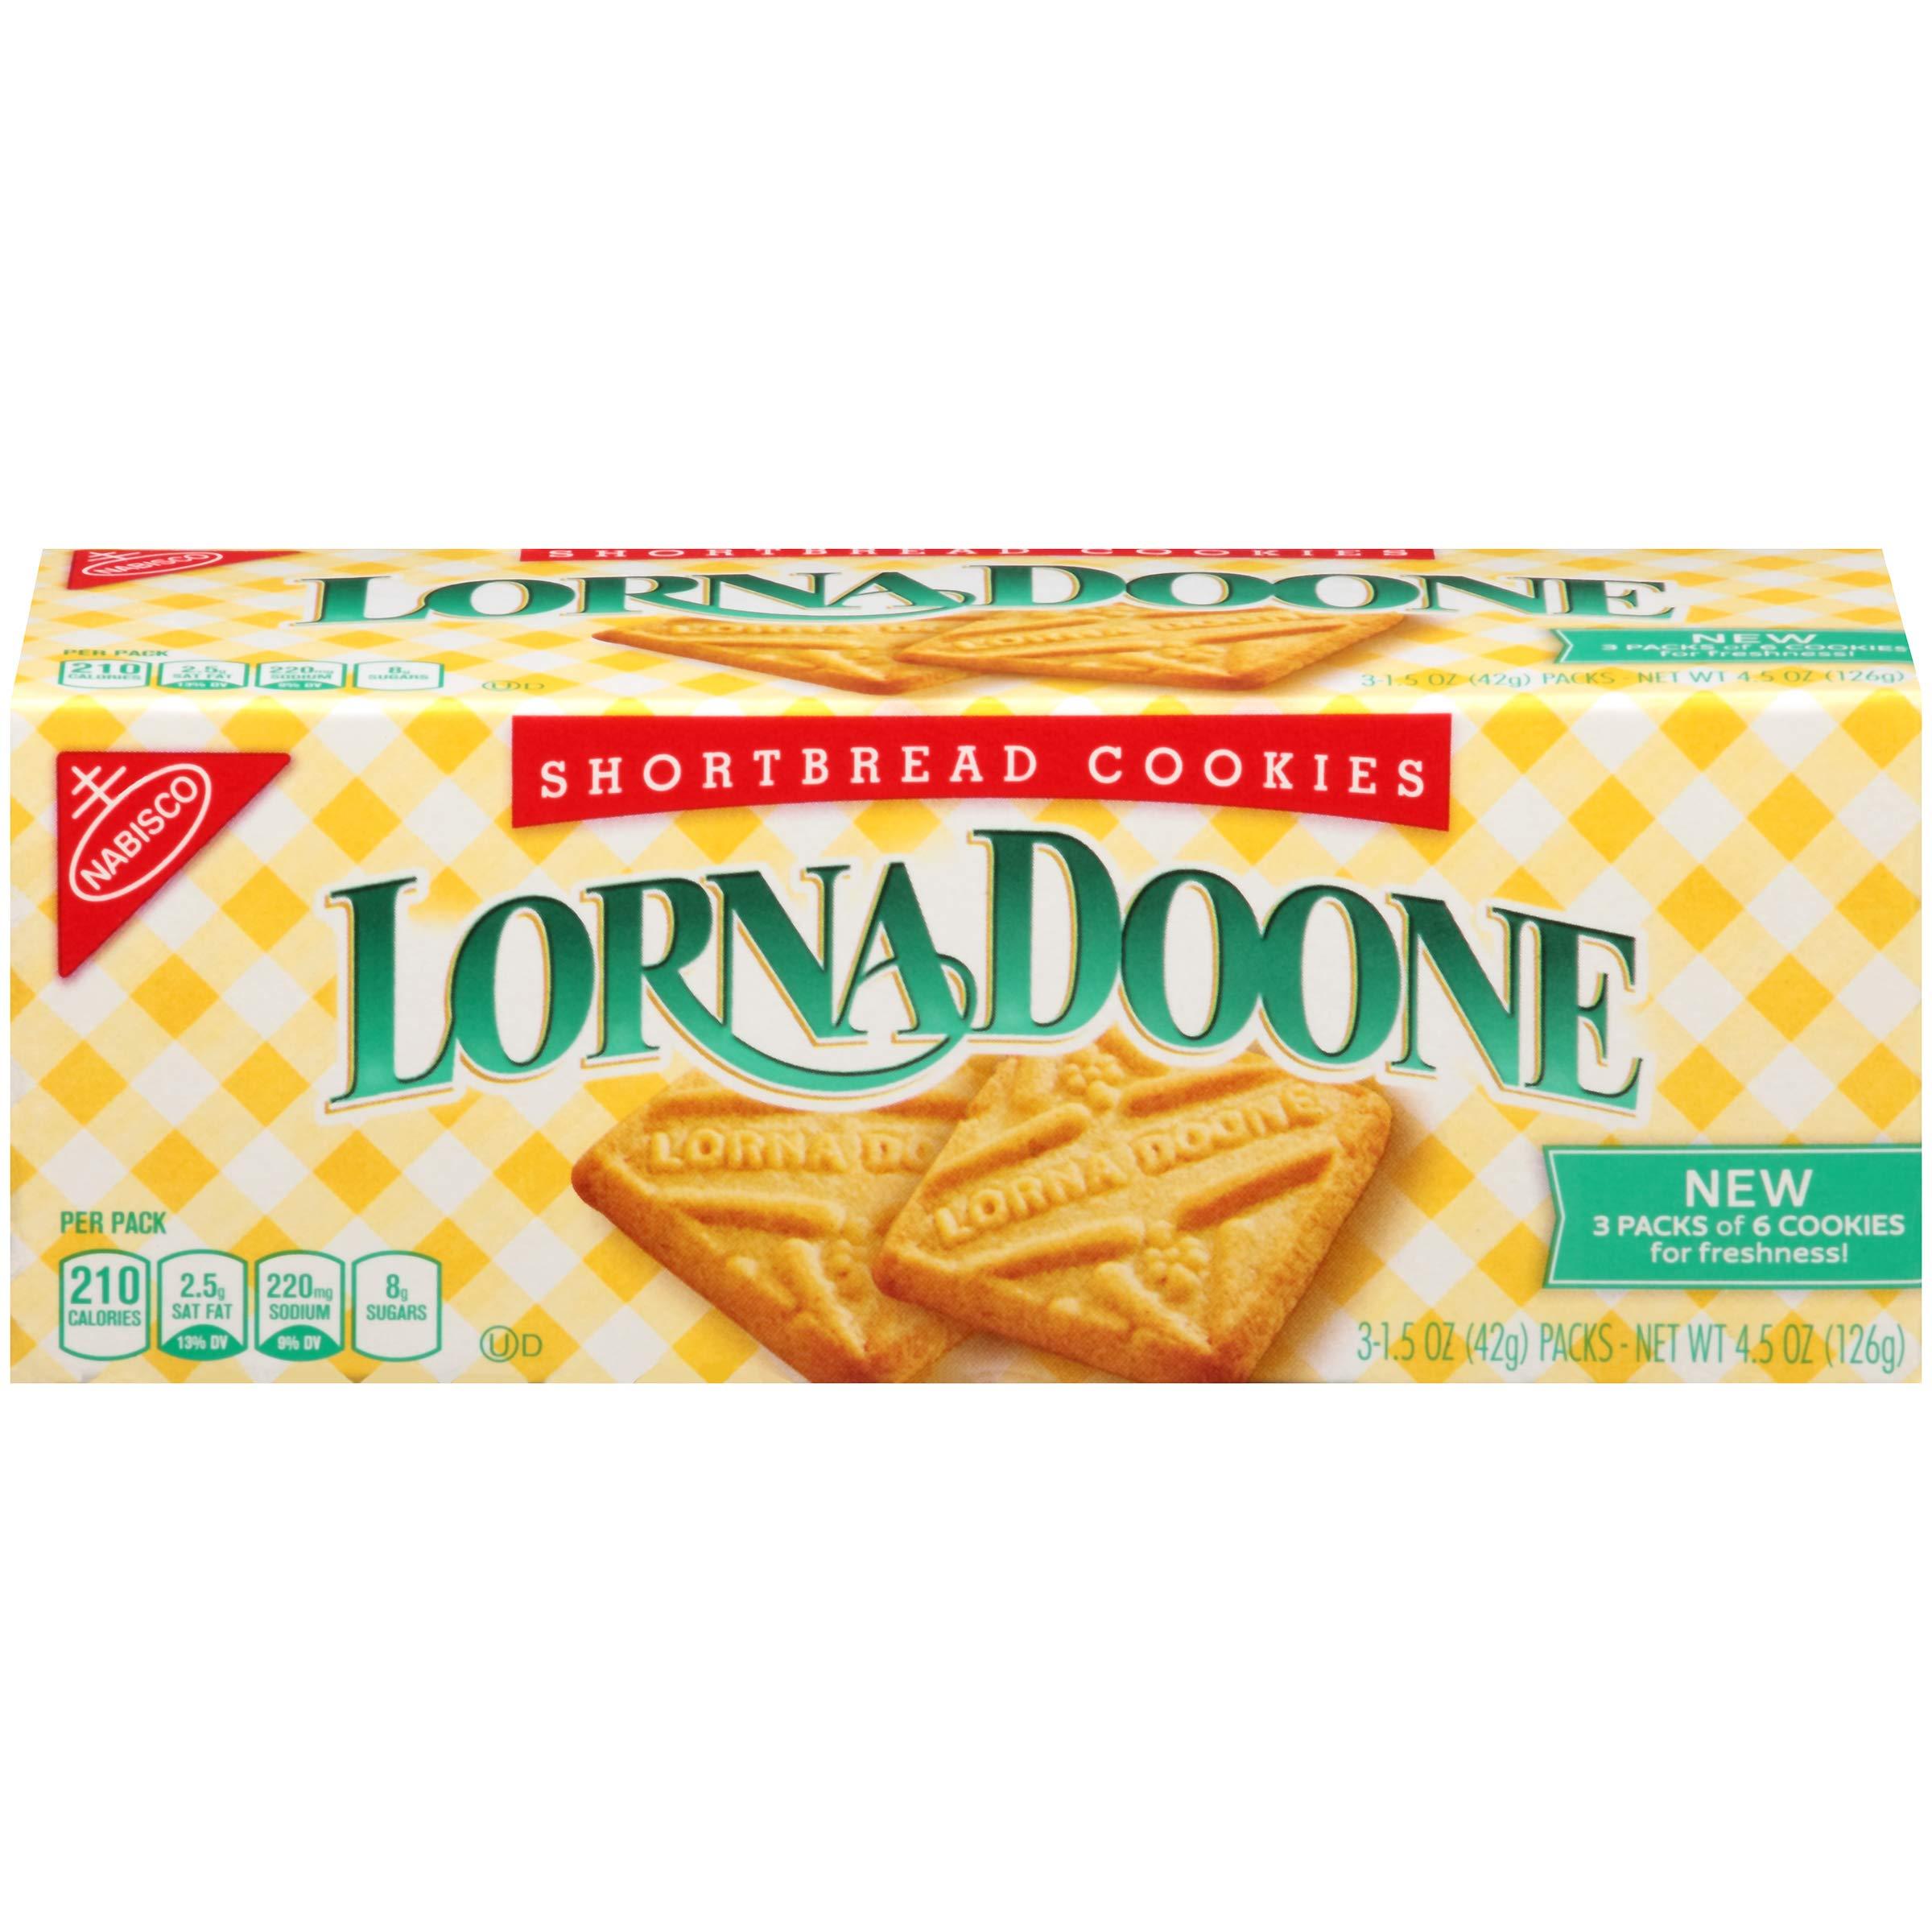 Lorna Doone Shortbread Cookies, 4.5 Ounce (Pack of 12) by Lorna Doone